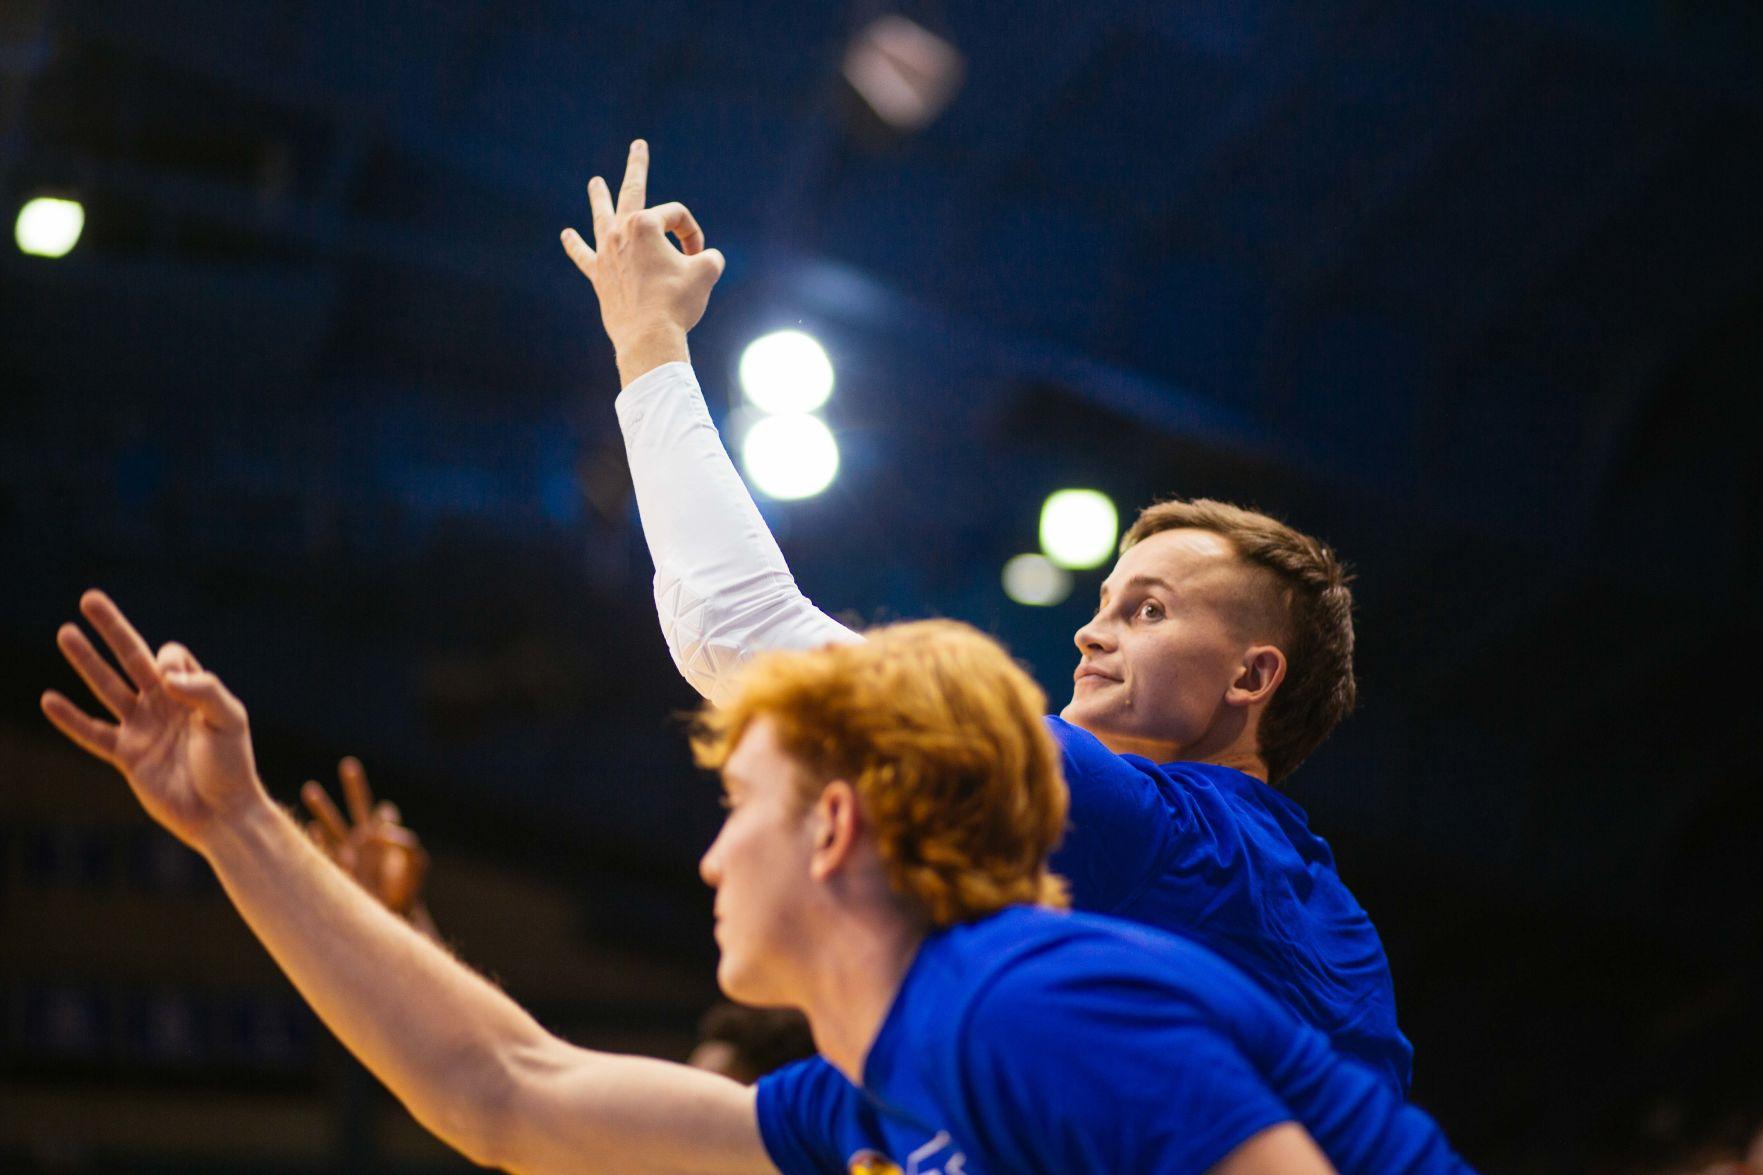 Chris Teahan Kansas Jayhawks Basketball Jersey-Blue